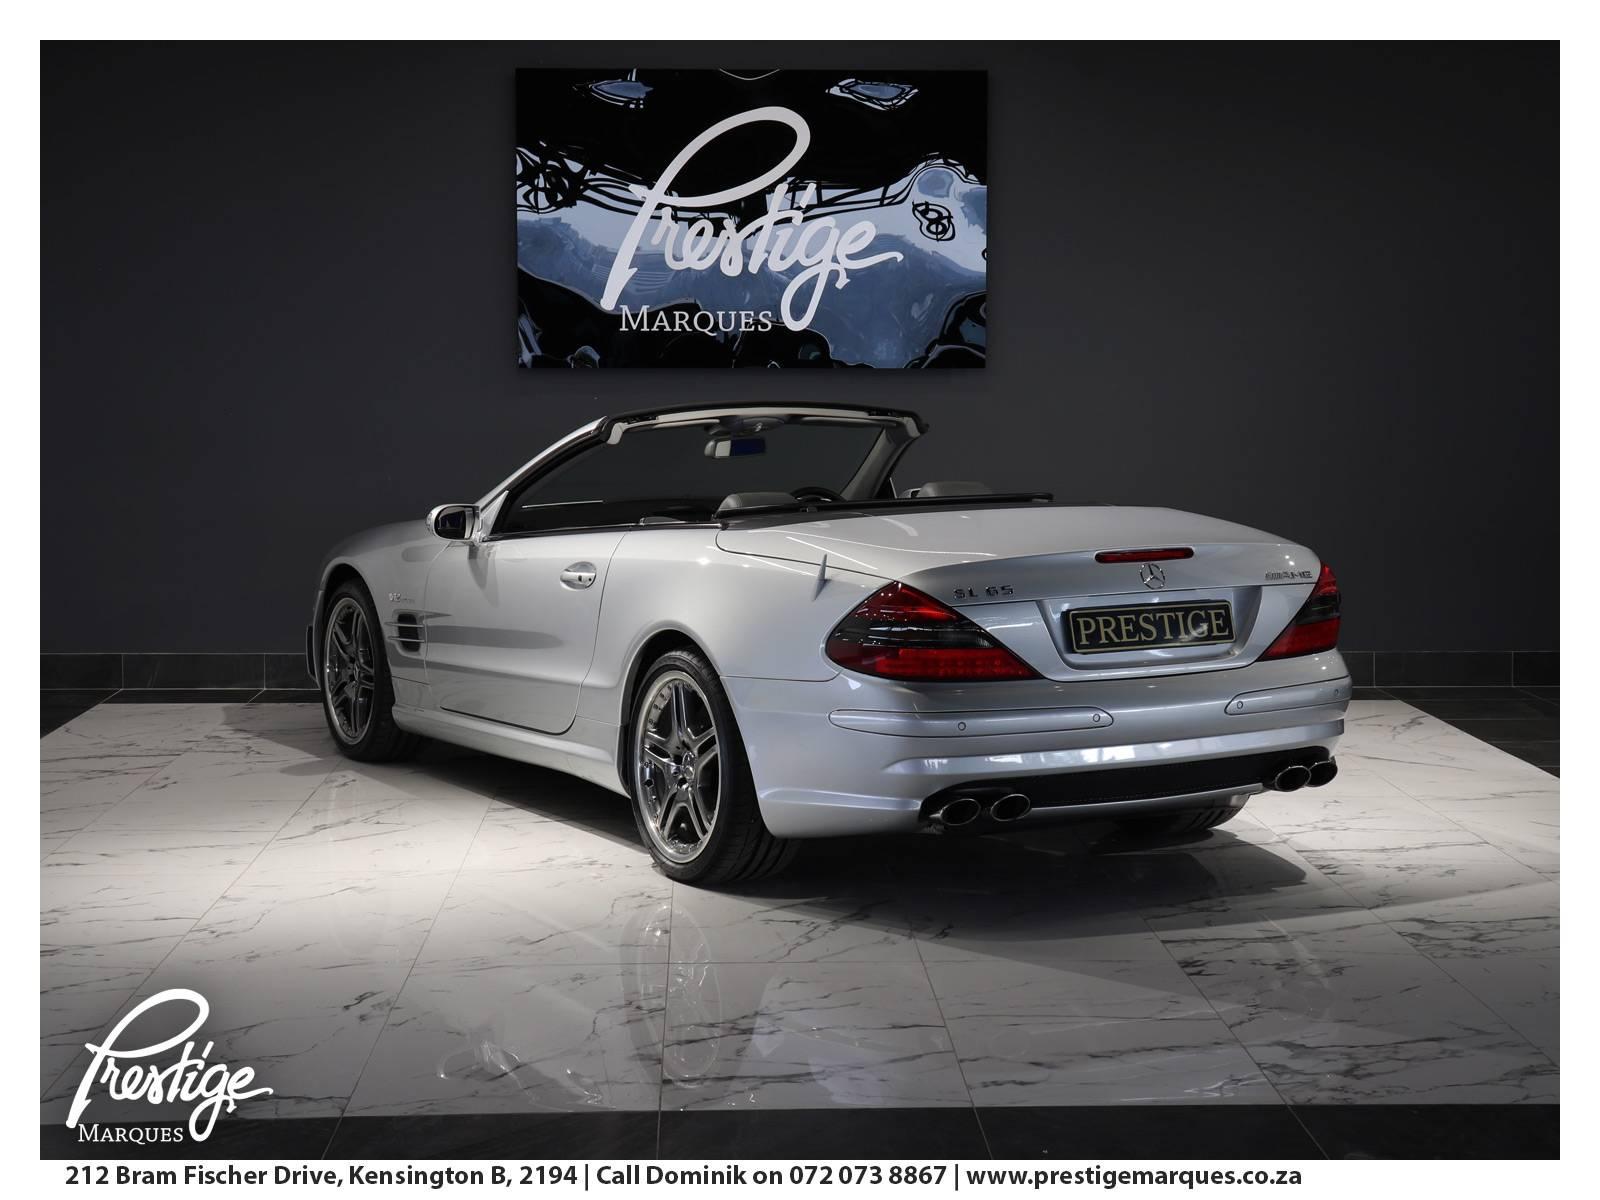 2006-Mercedes-Benz-SL65-AMG-Prestige-Marques-Randburg-Sandton-8